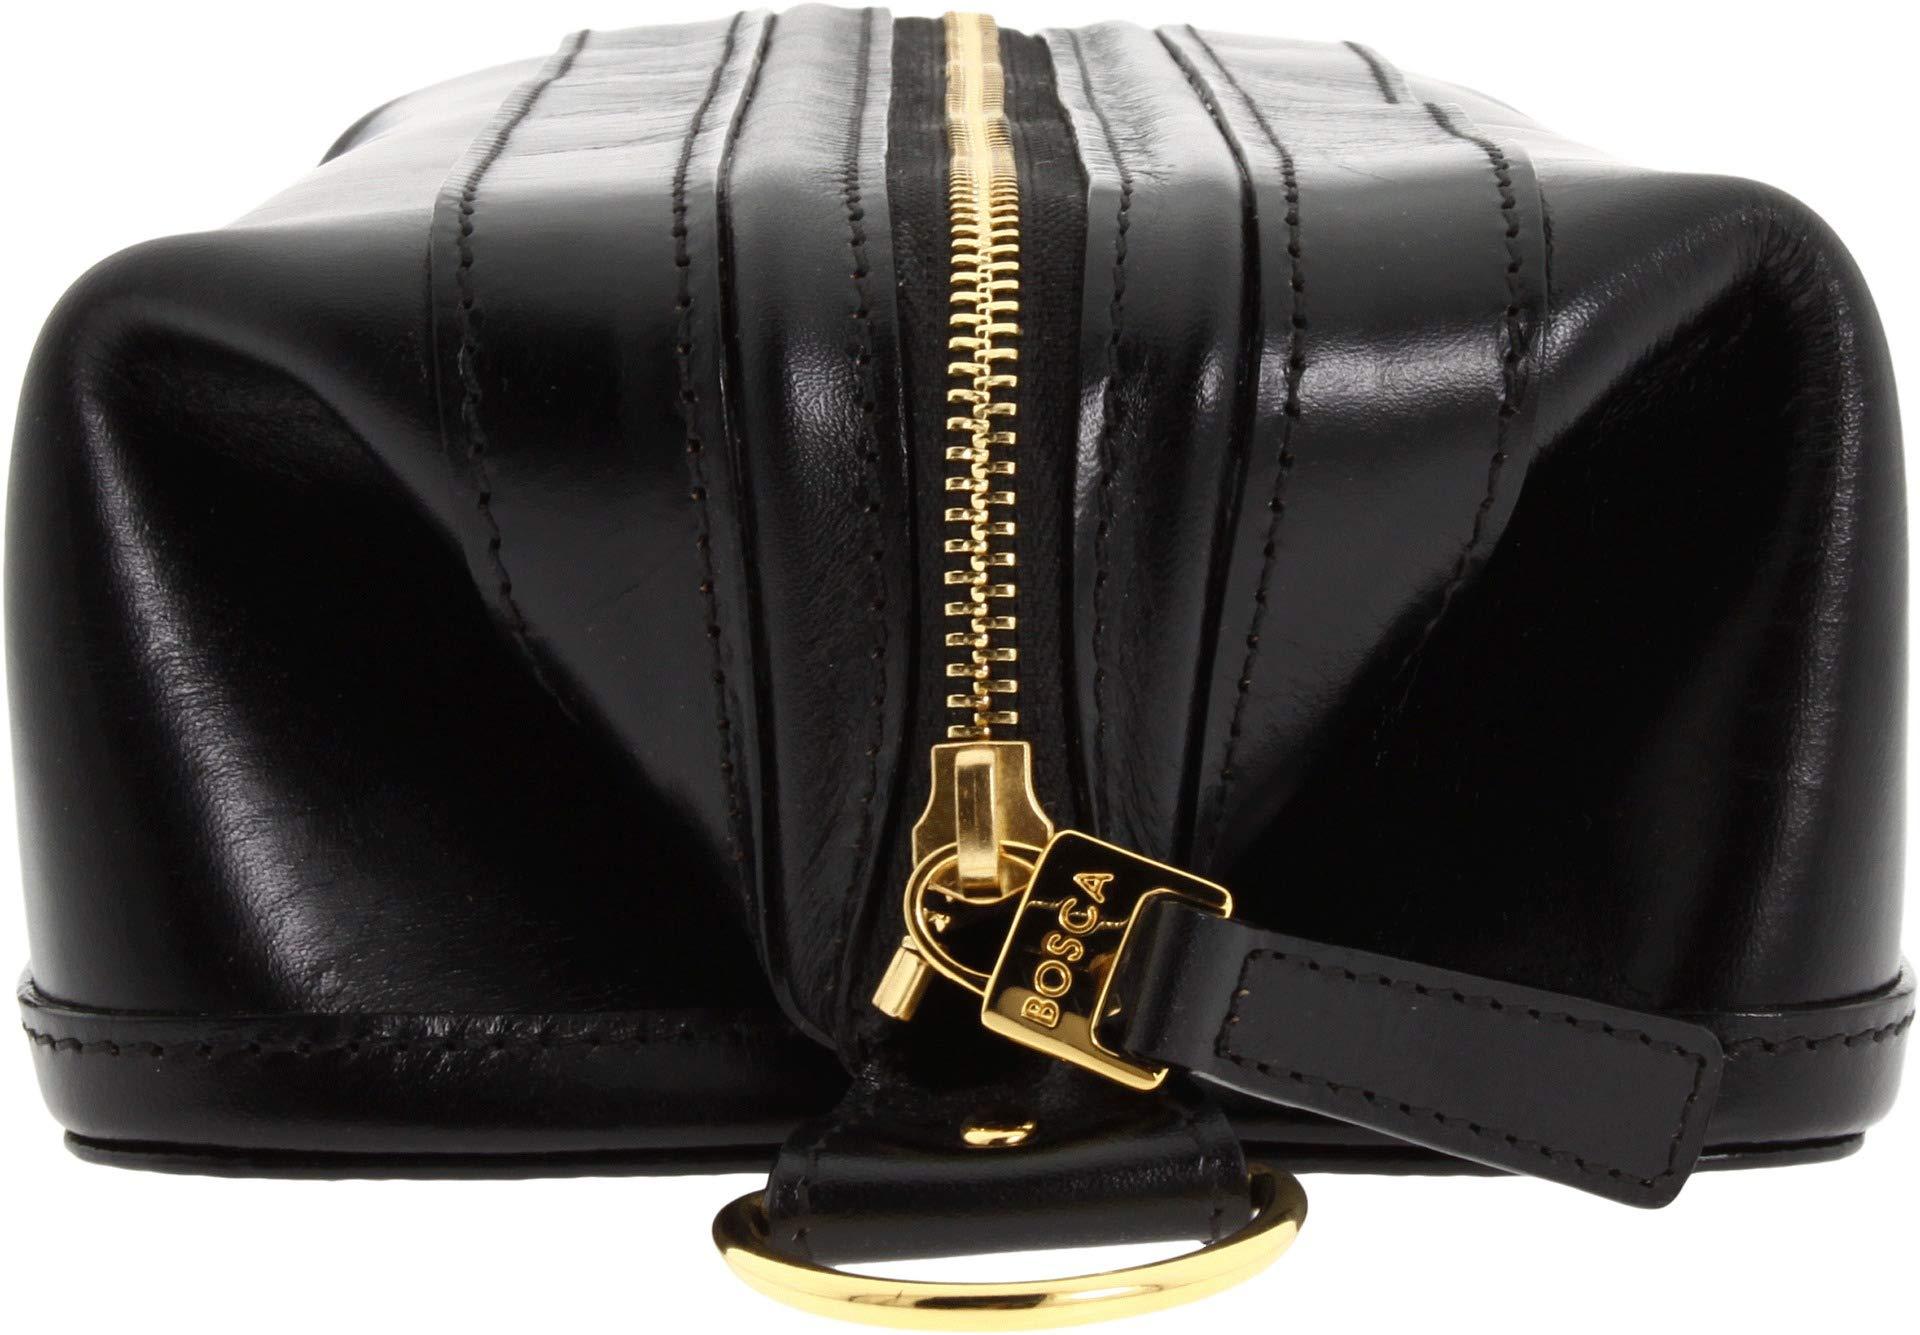 Bosca Men's 10'' Zipper Utilikit, Black by Bosca (Image #3)